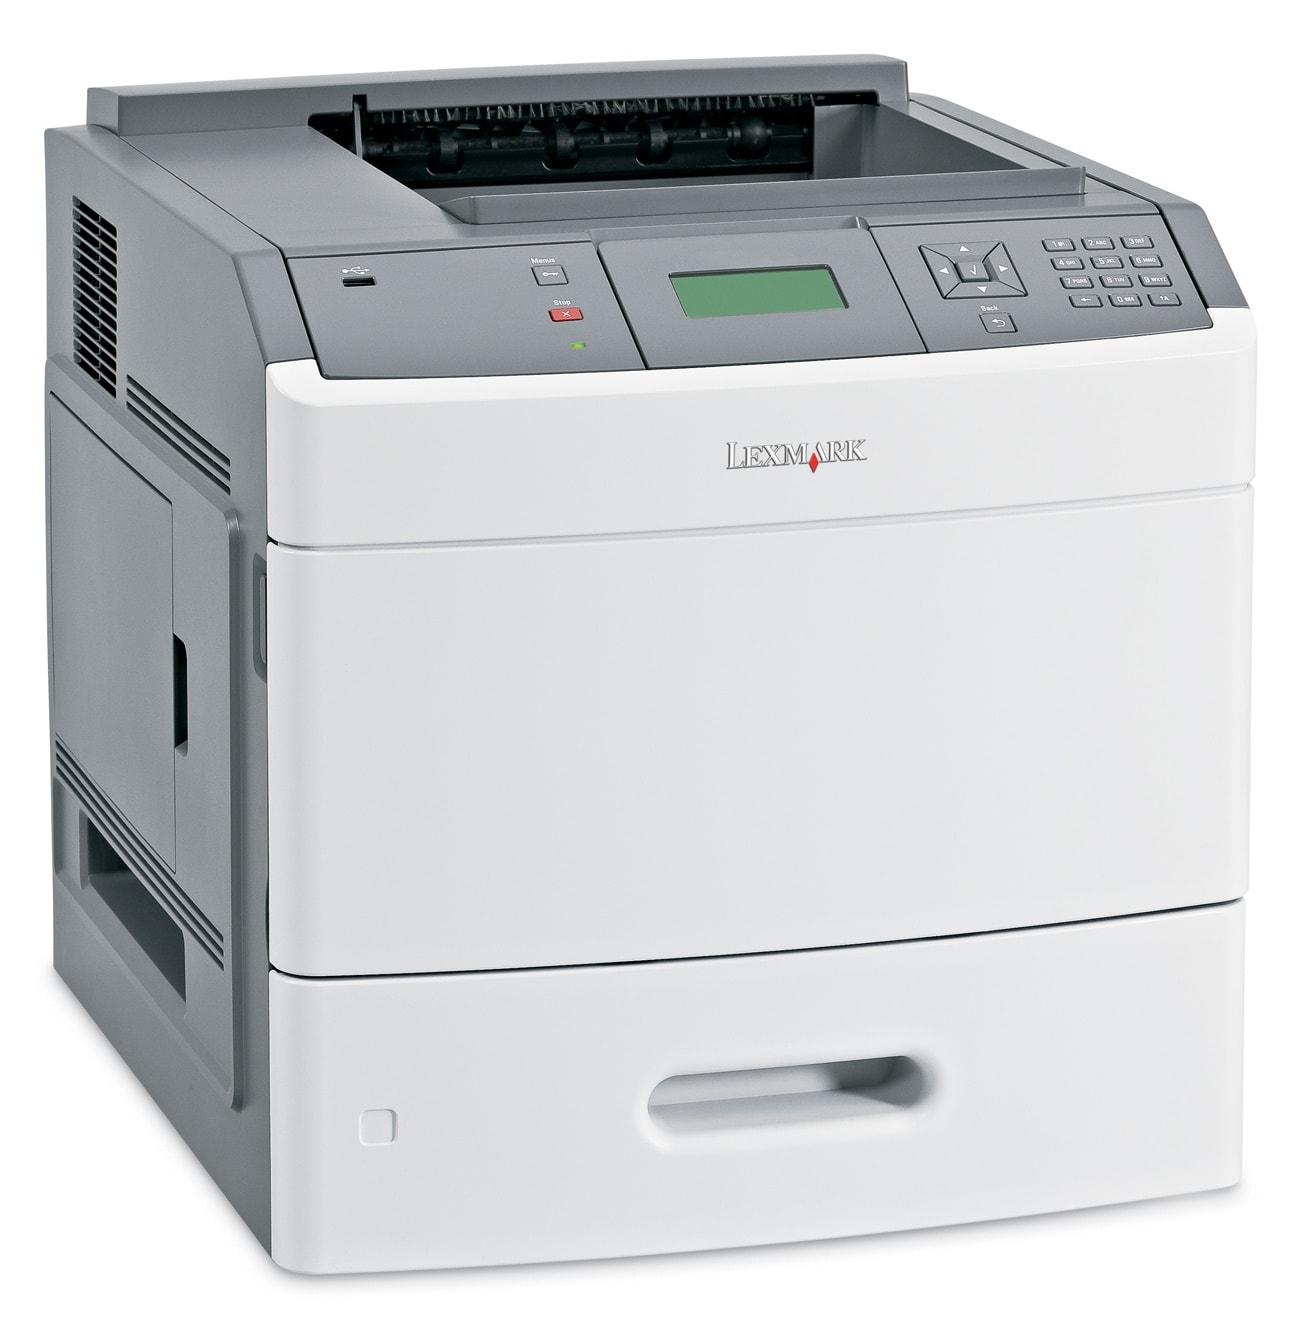 Lexmark T654n Printer Driver